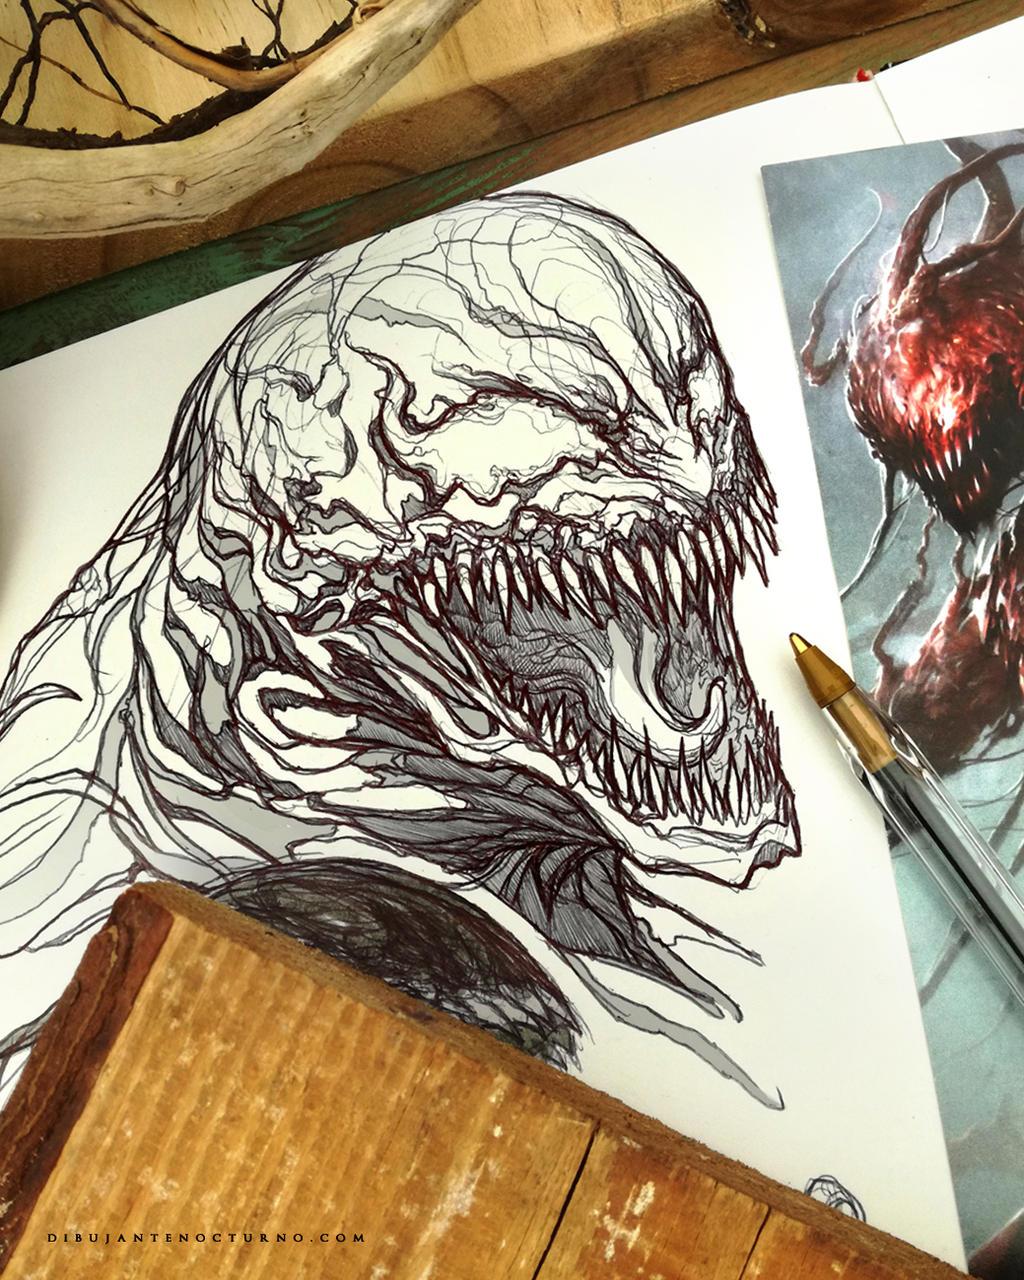 Dibujante-nocturno's DeviantArt Gallery